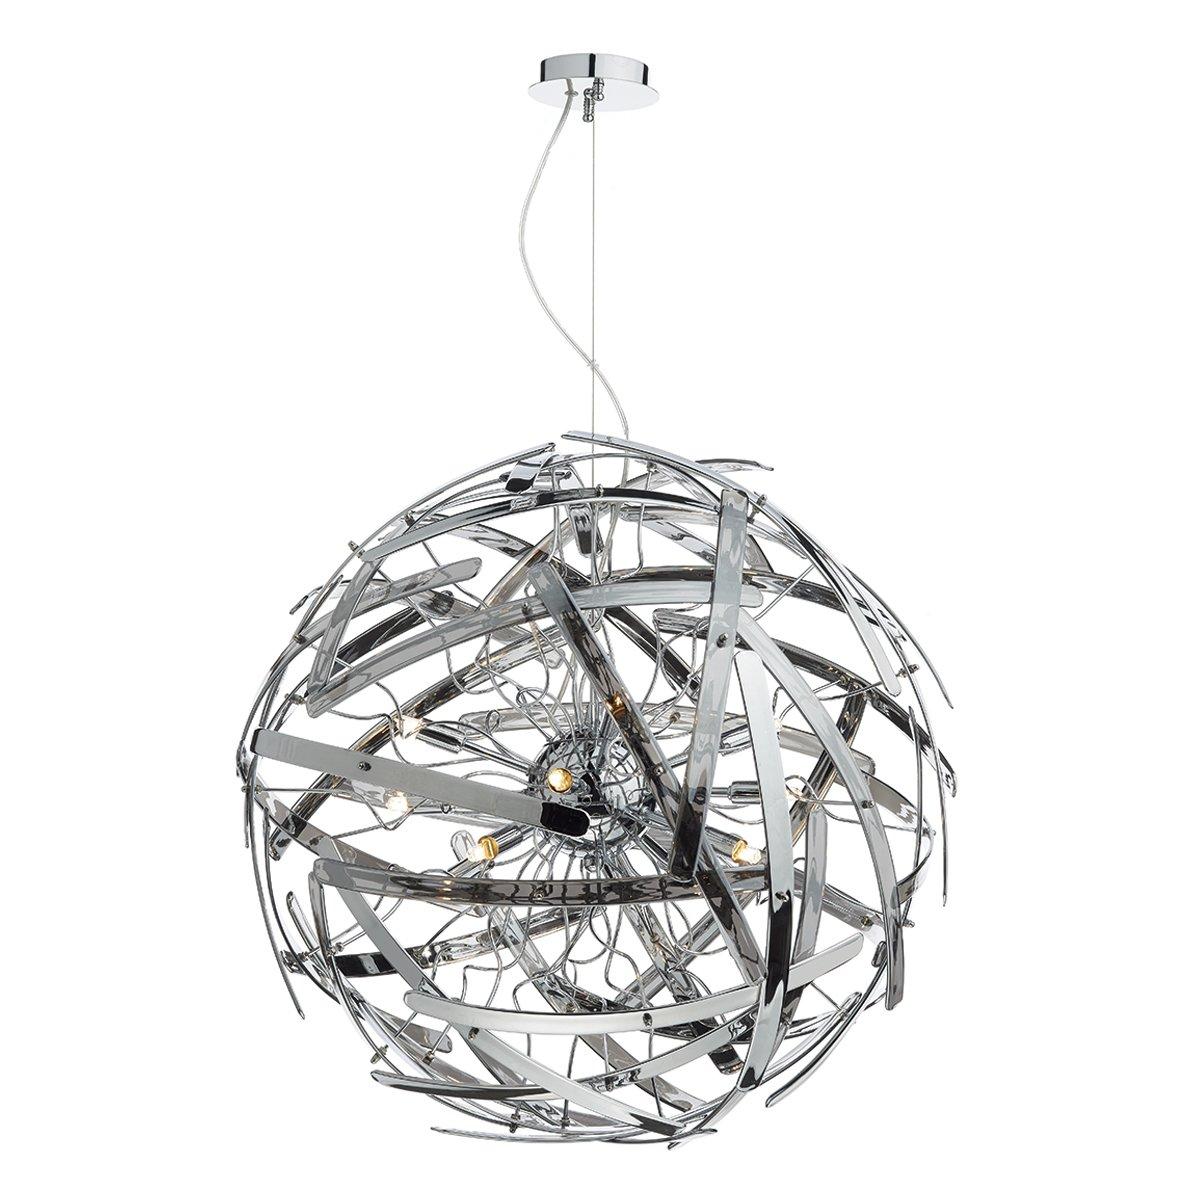 Dar MEL1210 Melba 12 Light Ball Pendant with smoked Glass